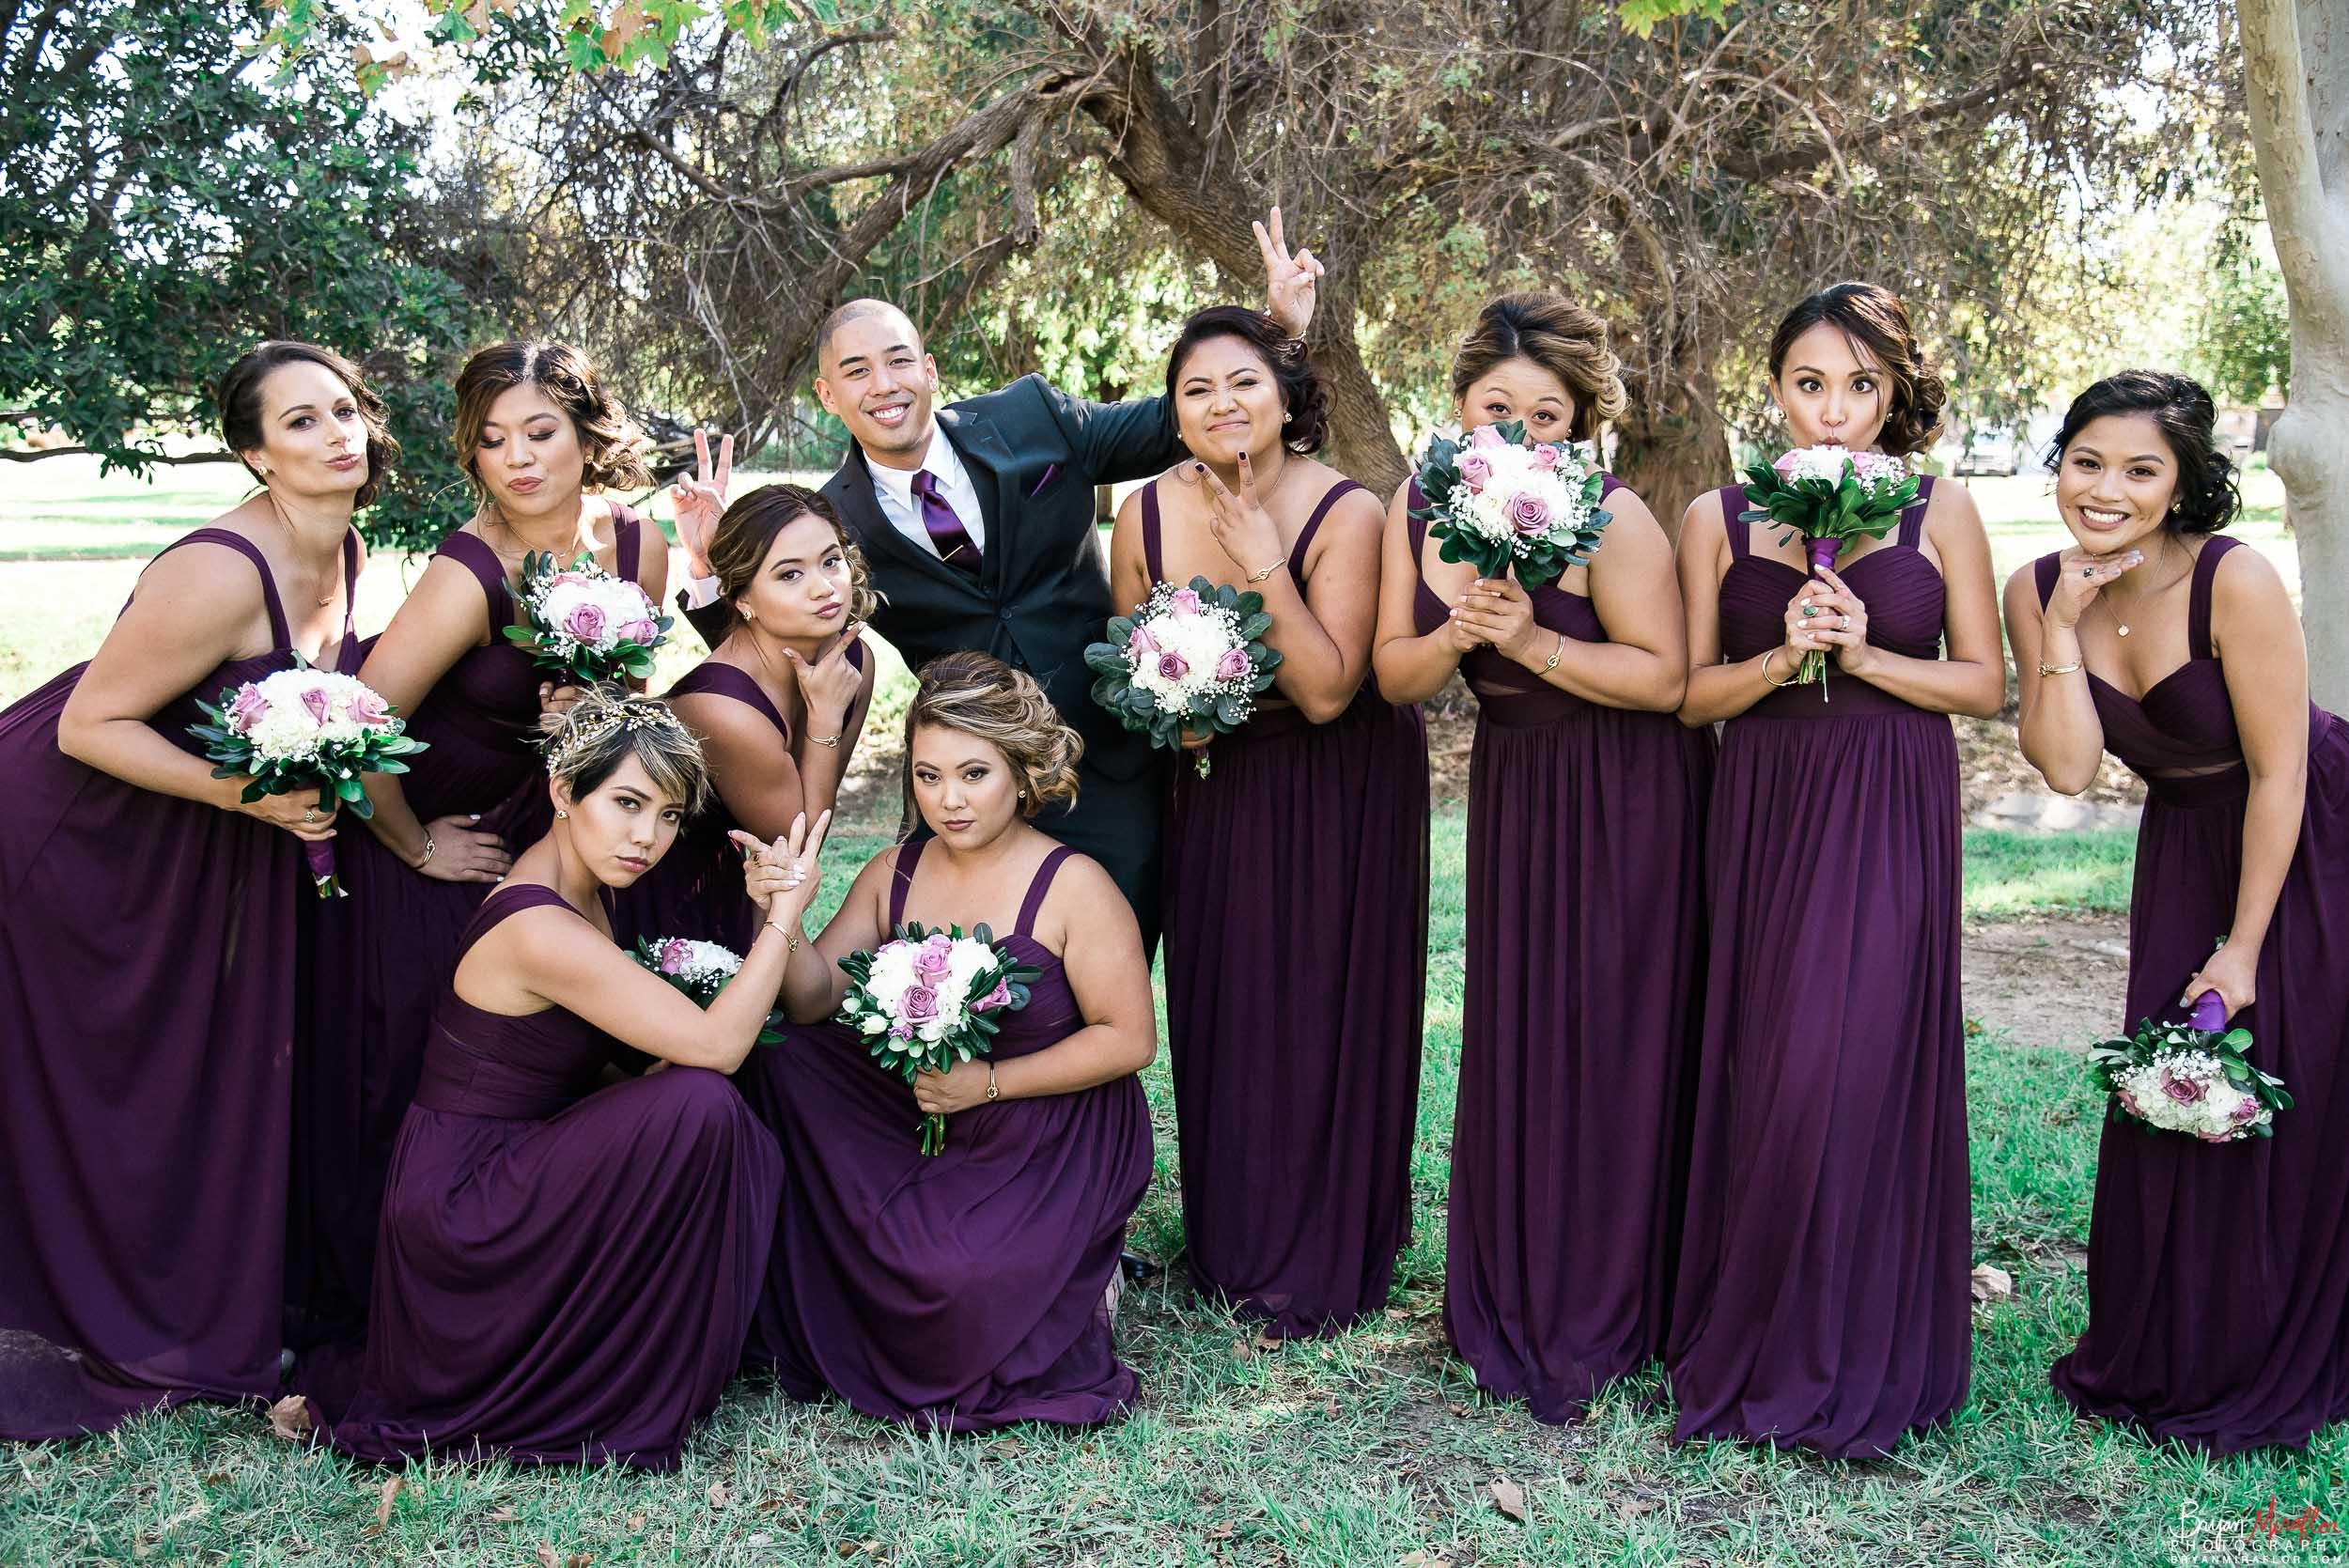 Bryan-Miraflor-Photography-Trisha-Dexter-Married-20170923-037.jpg